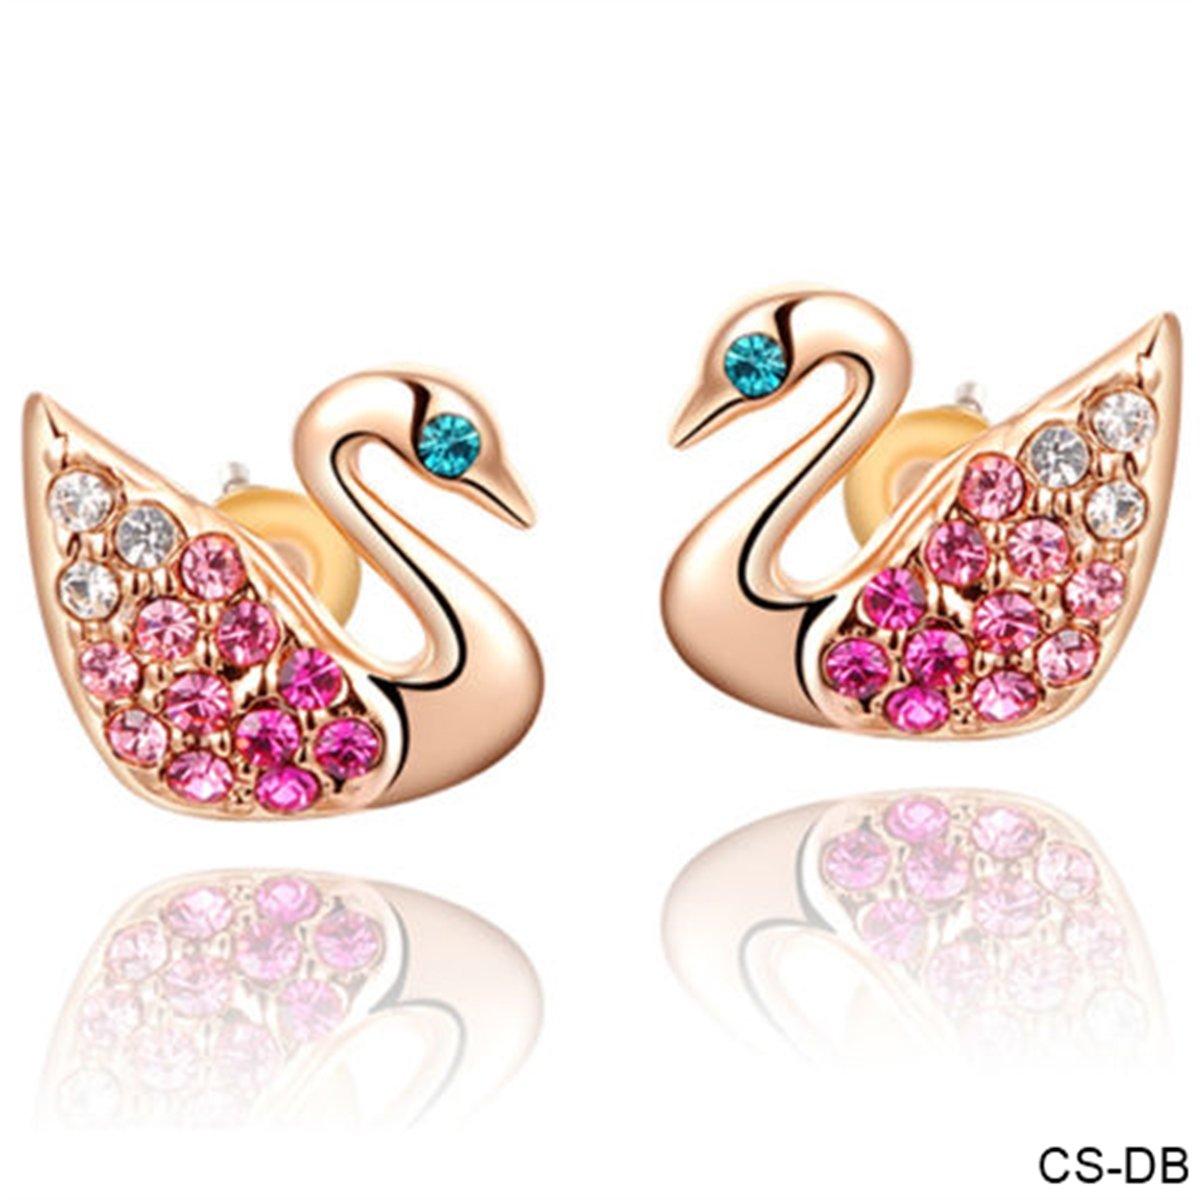 CS-DB 18K Rose Gold Plated Swarovski Pink Crystal Swan Stud Earrings Jewelry